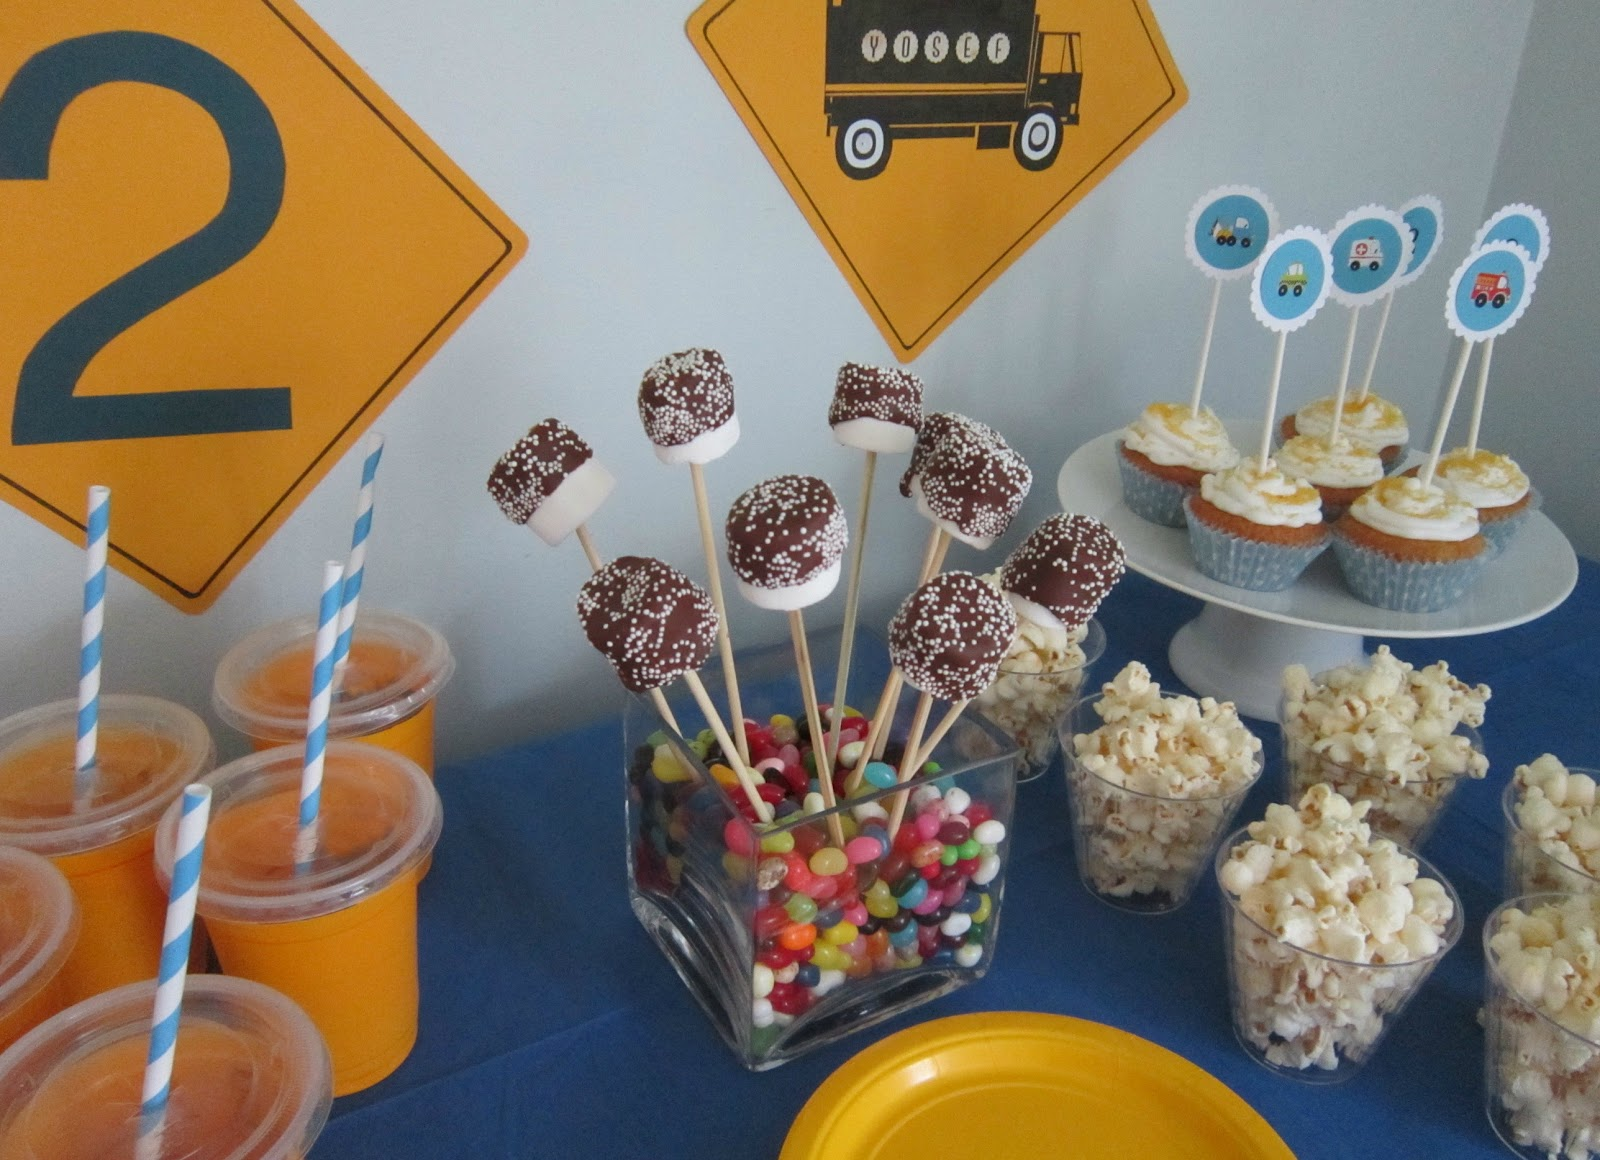 Imagenes De Birthday Activities For 13 Year Old Boy 50 Unforgettable Kids Party Places In Atlanta Design Megillah 02 12